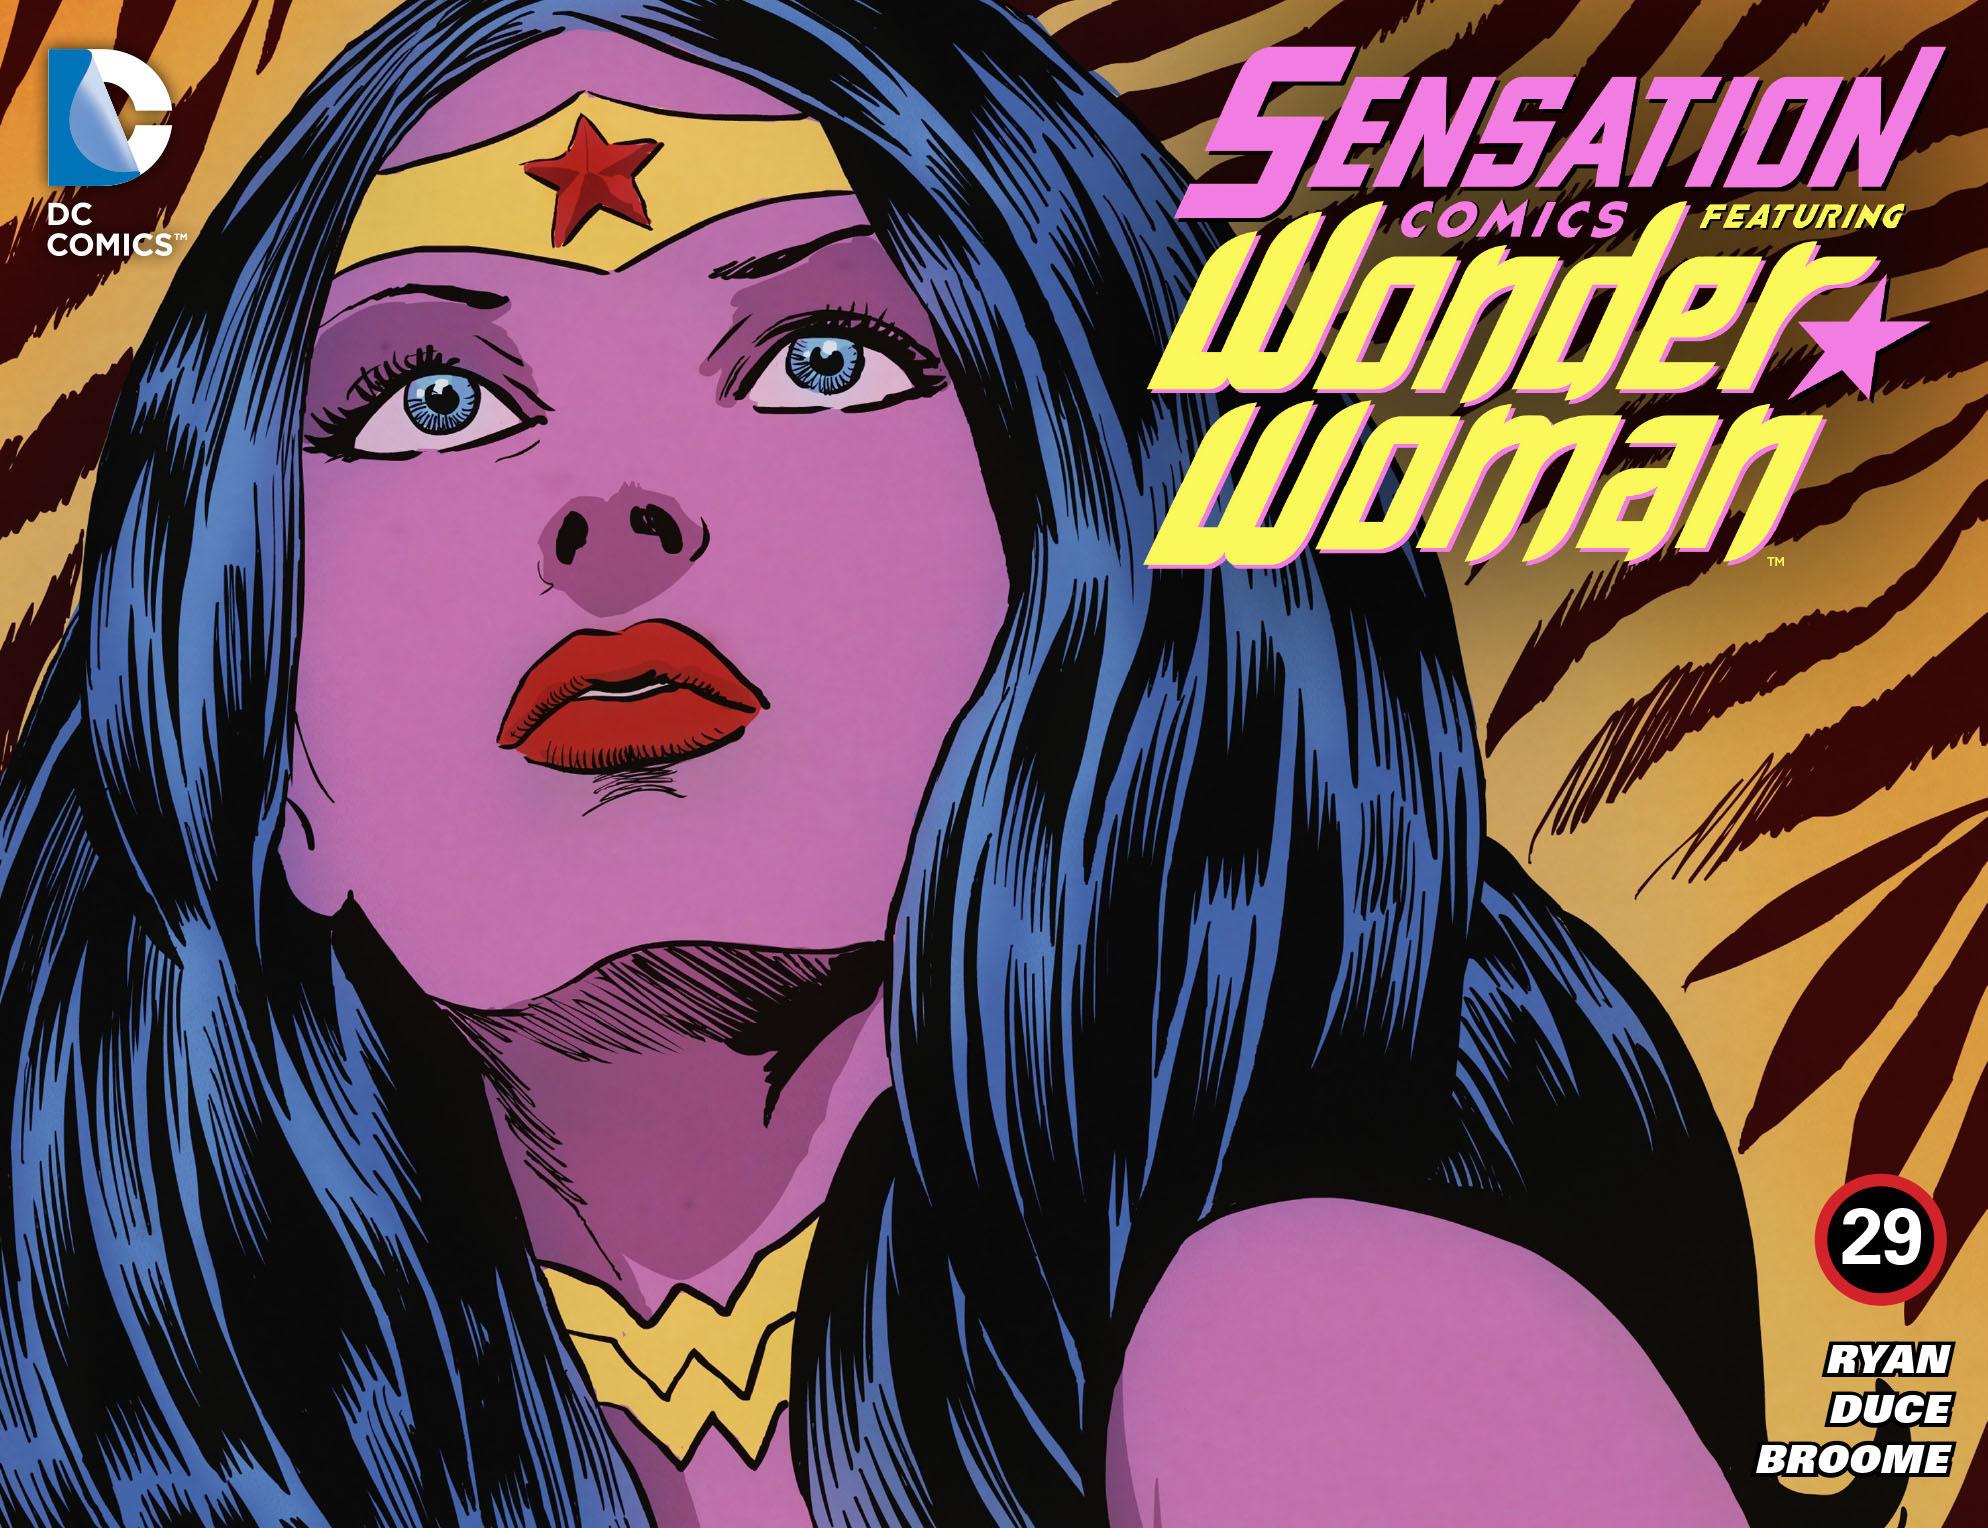 Read online Sensation Comics Featuring Wonder Woman comic -  Issue #29 - 1